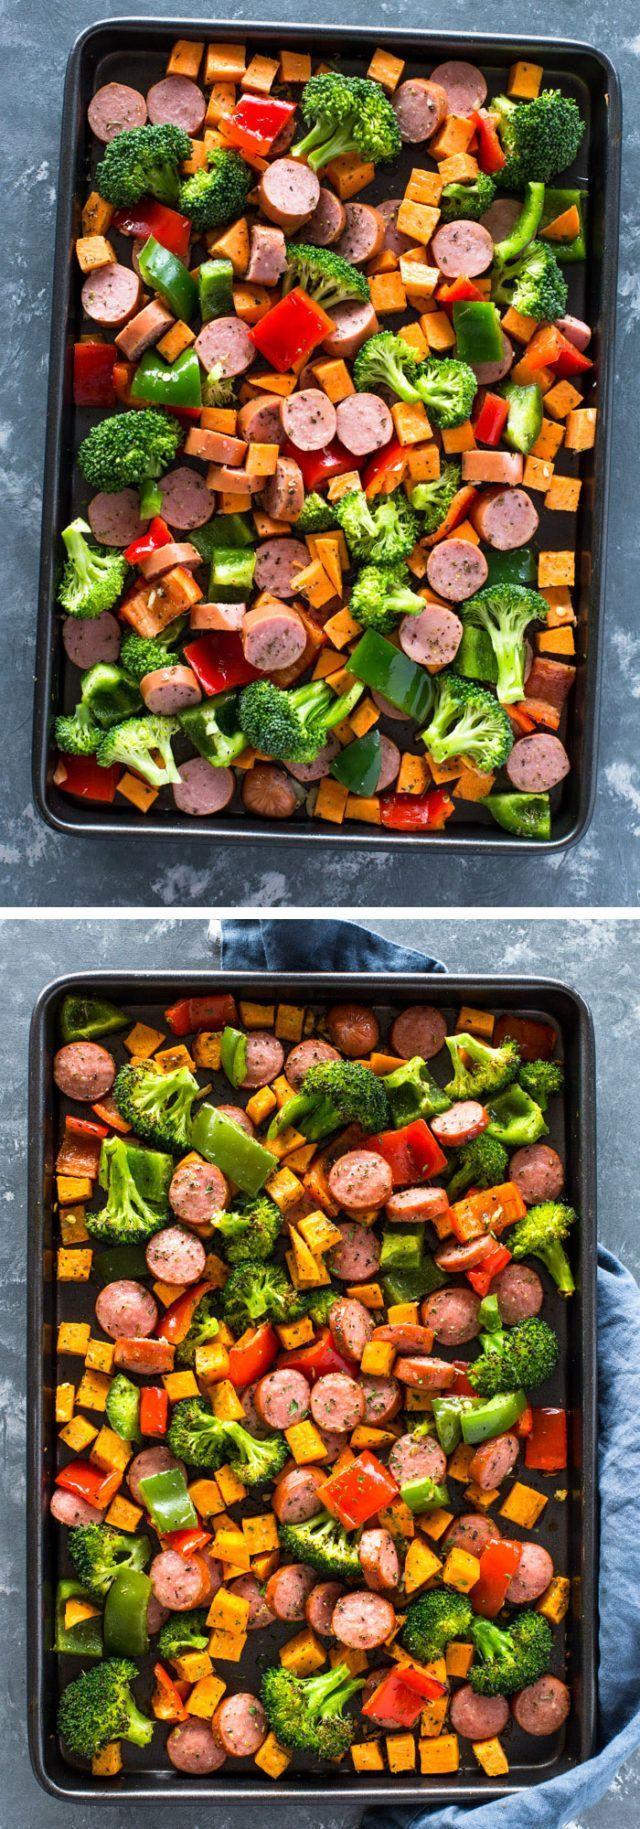 Healthy 20 Minute Sheet Pan Sausage and Veggies #onepandinners Healthy 20 Minute Sheet Pan Sausage and Veggies | Gimme Delicious #onepandinnerschicken